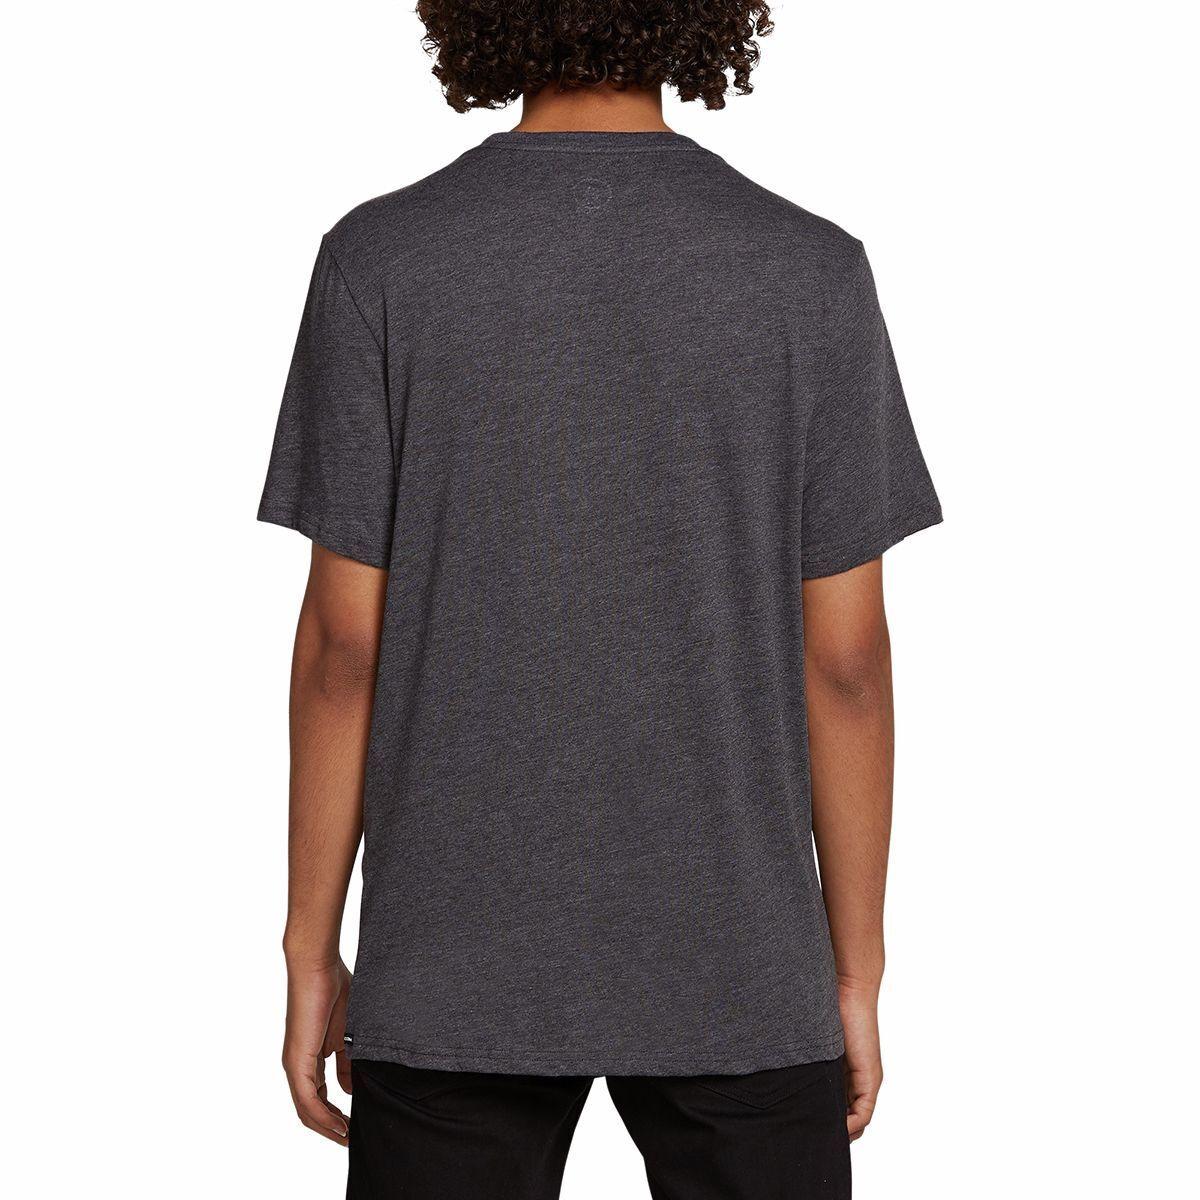 Volcom Solid Short Sleeve T-Shirt in Black